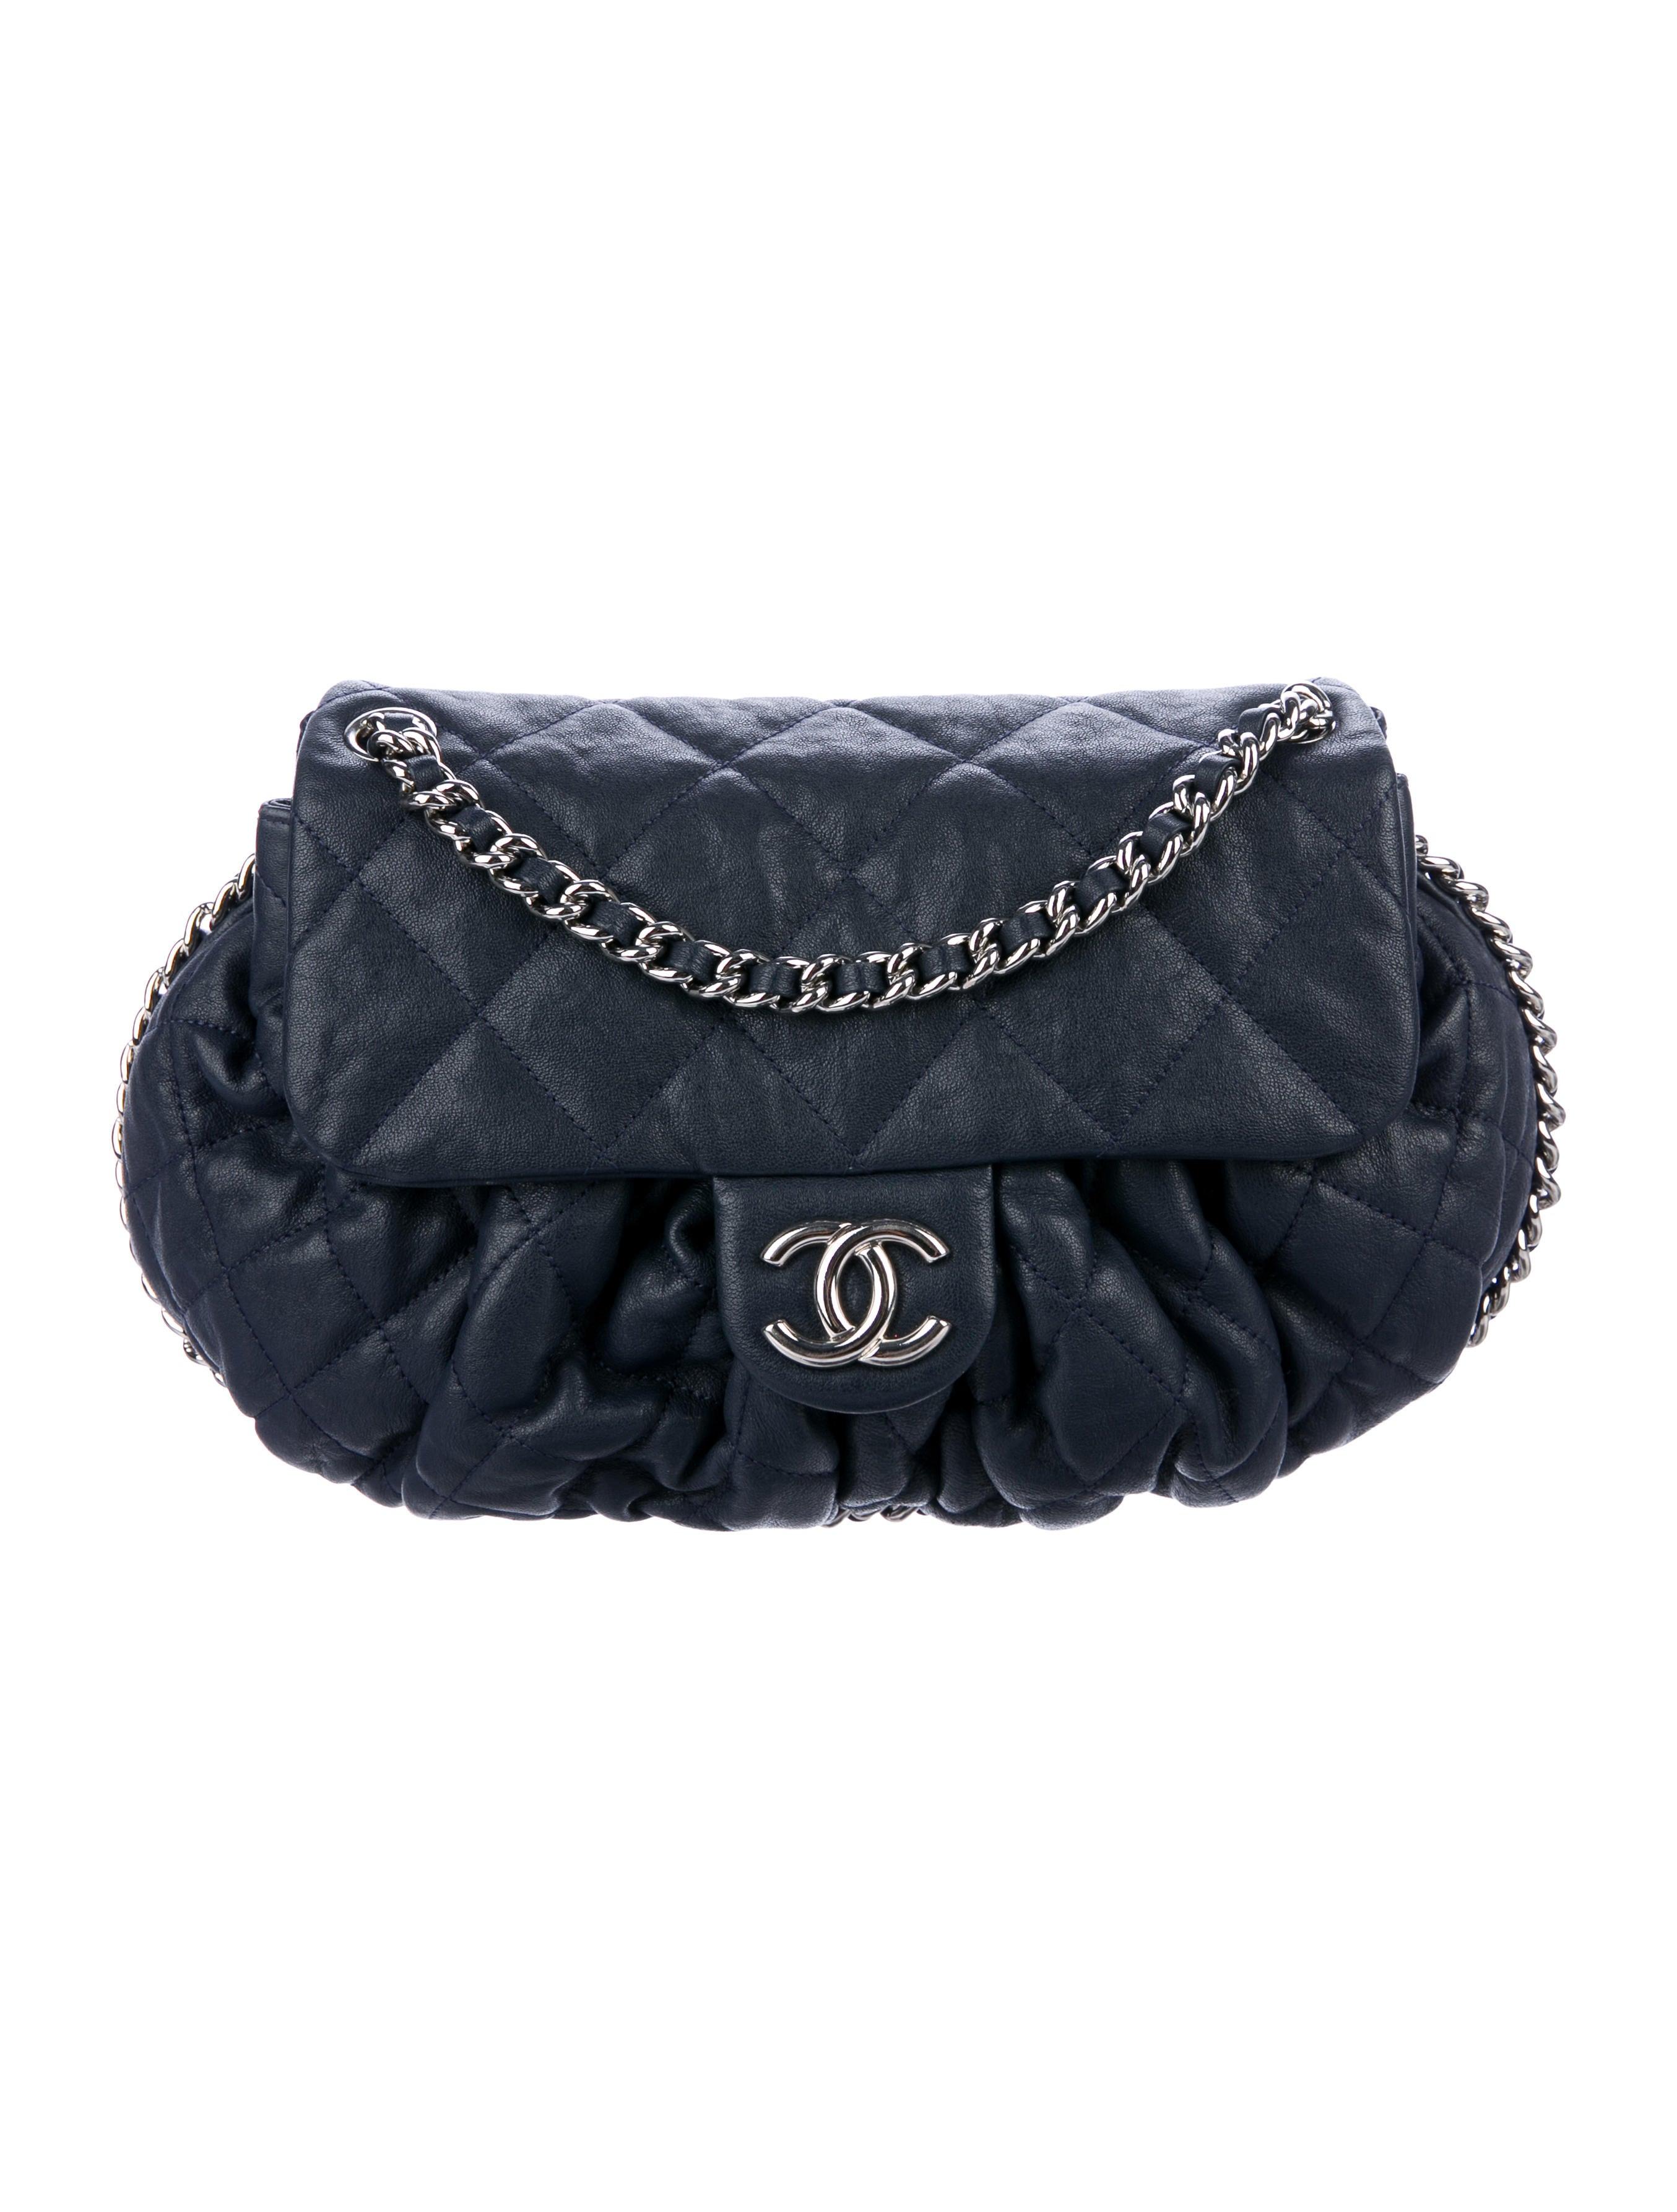 168050fcb4cc Chanel. Large Chain Around Messenger Bag. $2,250.00. Denim Patchwork Jumbo  Flap ...